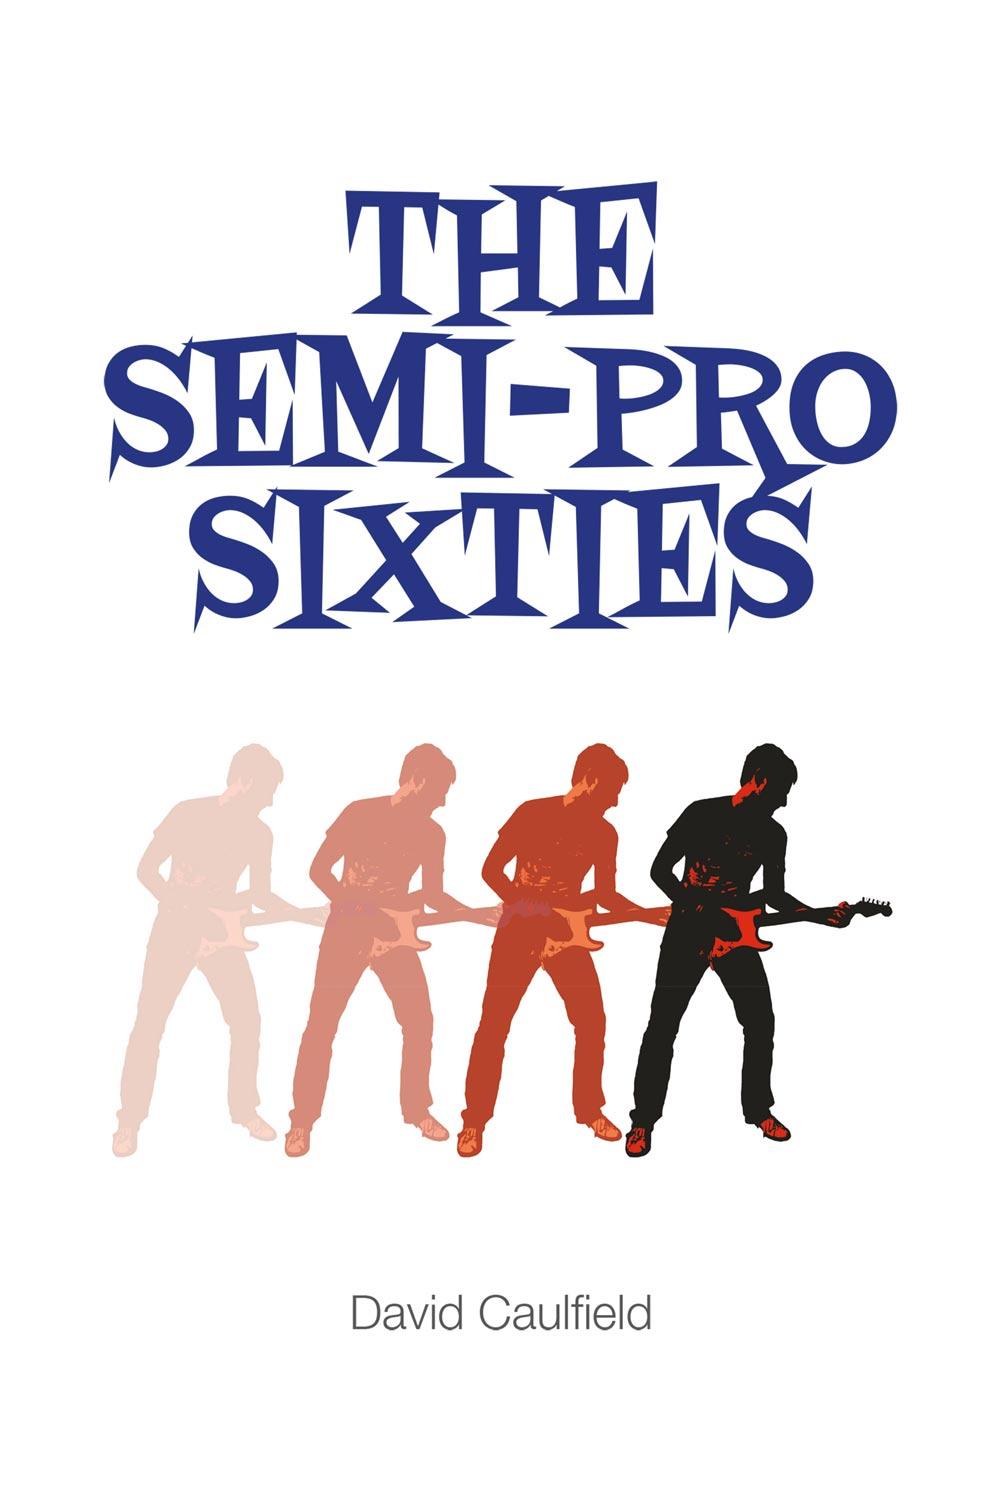 Semi pro sixties book